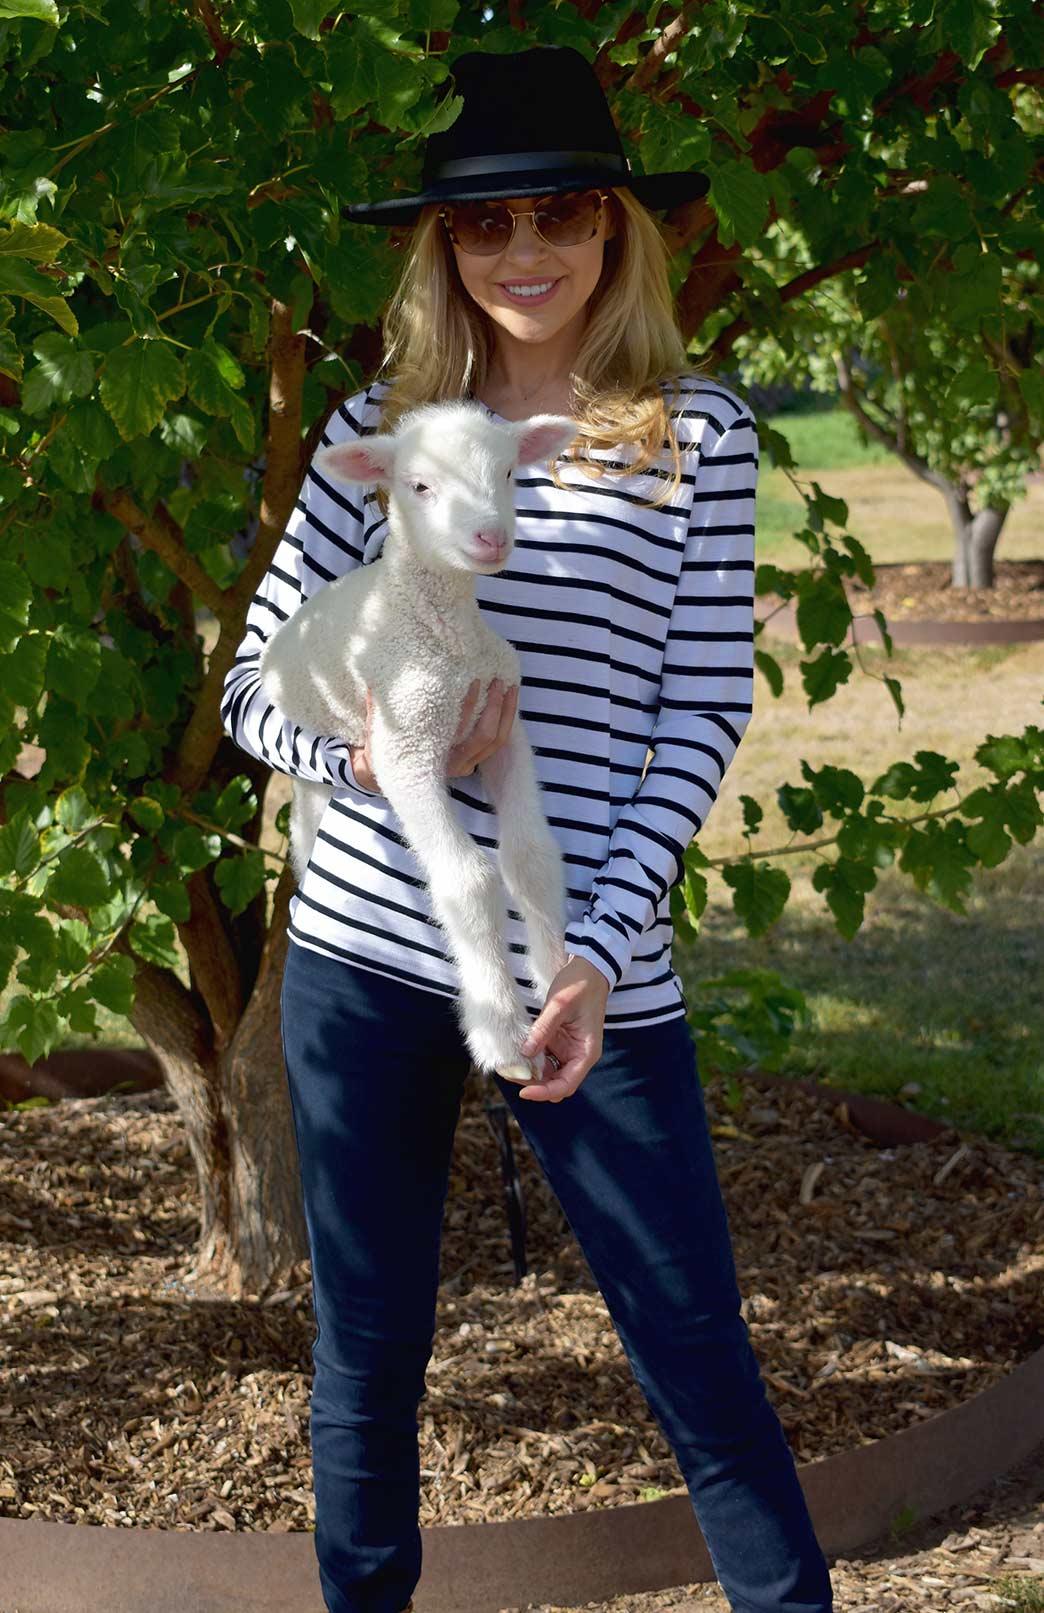 Round Neck Top - Rib Fabric - Women's White & Black French Striped Merino Wool Long Sleeve Top - Smitten Merino Tasmania Australia